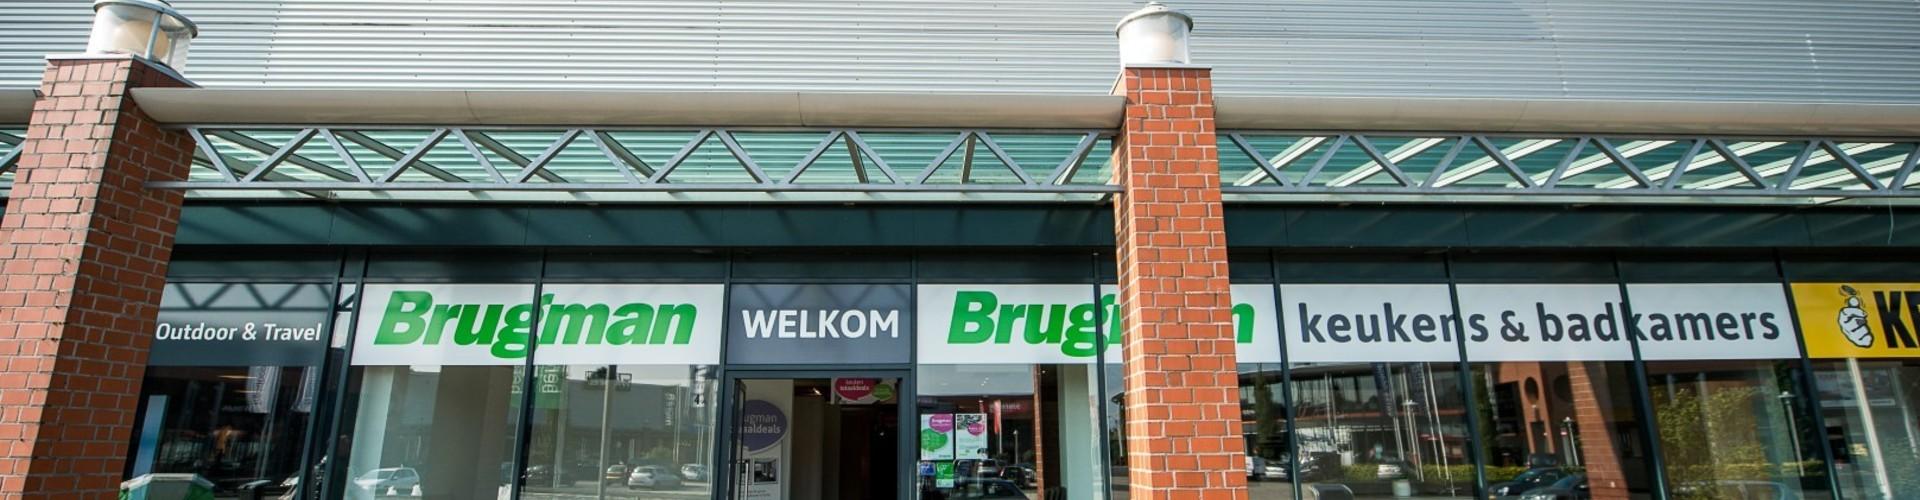 Brugman Keukens Badkamers Tref Center Venlo